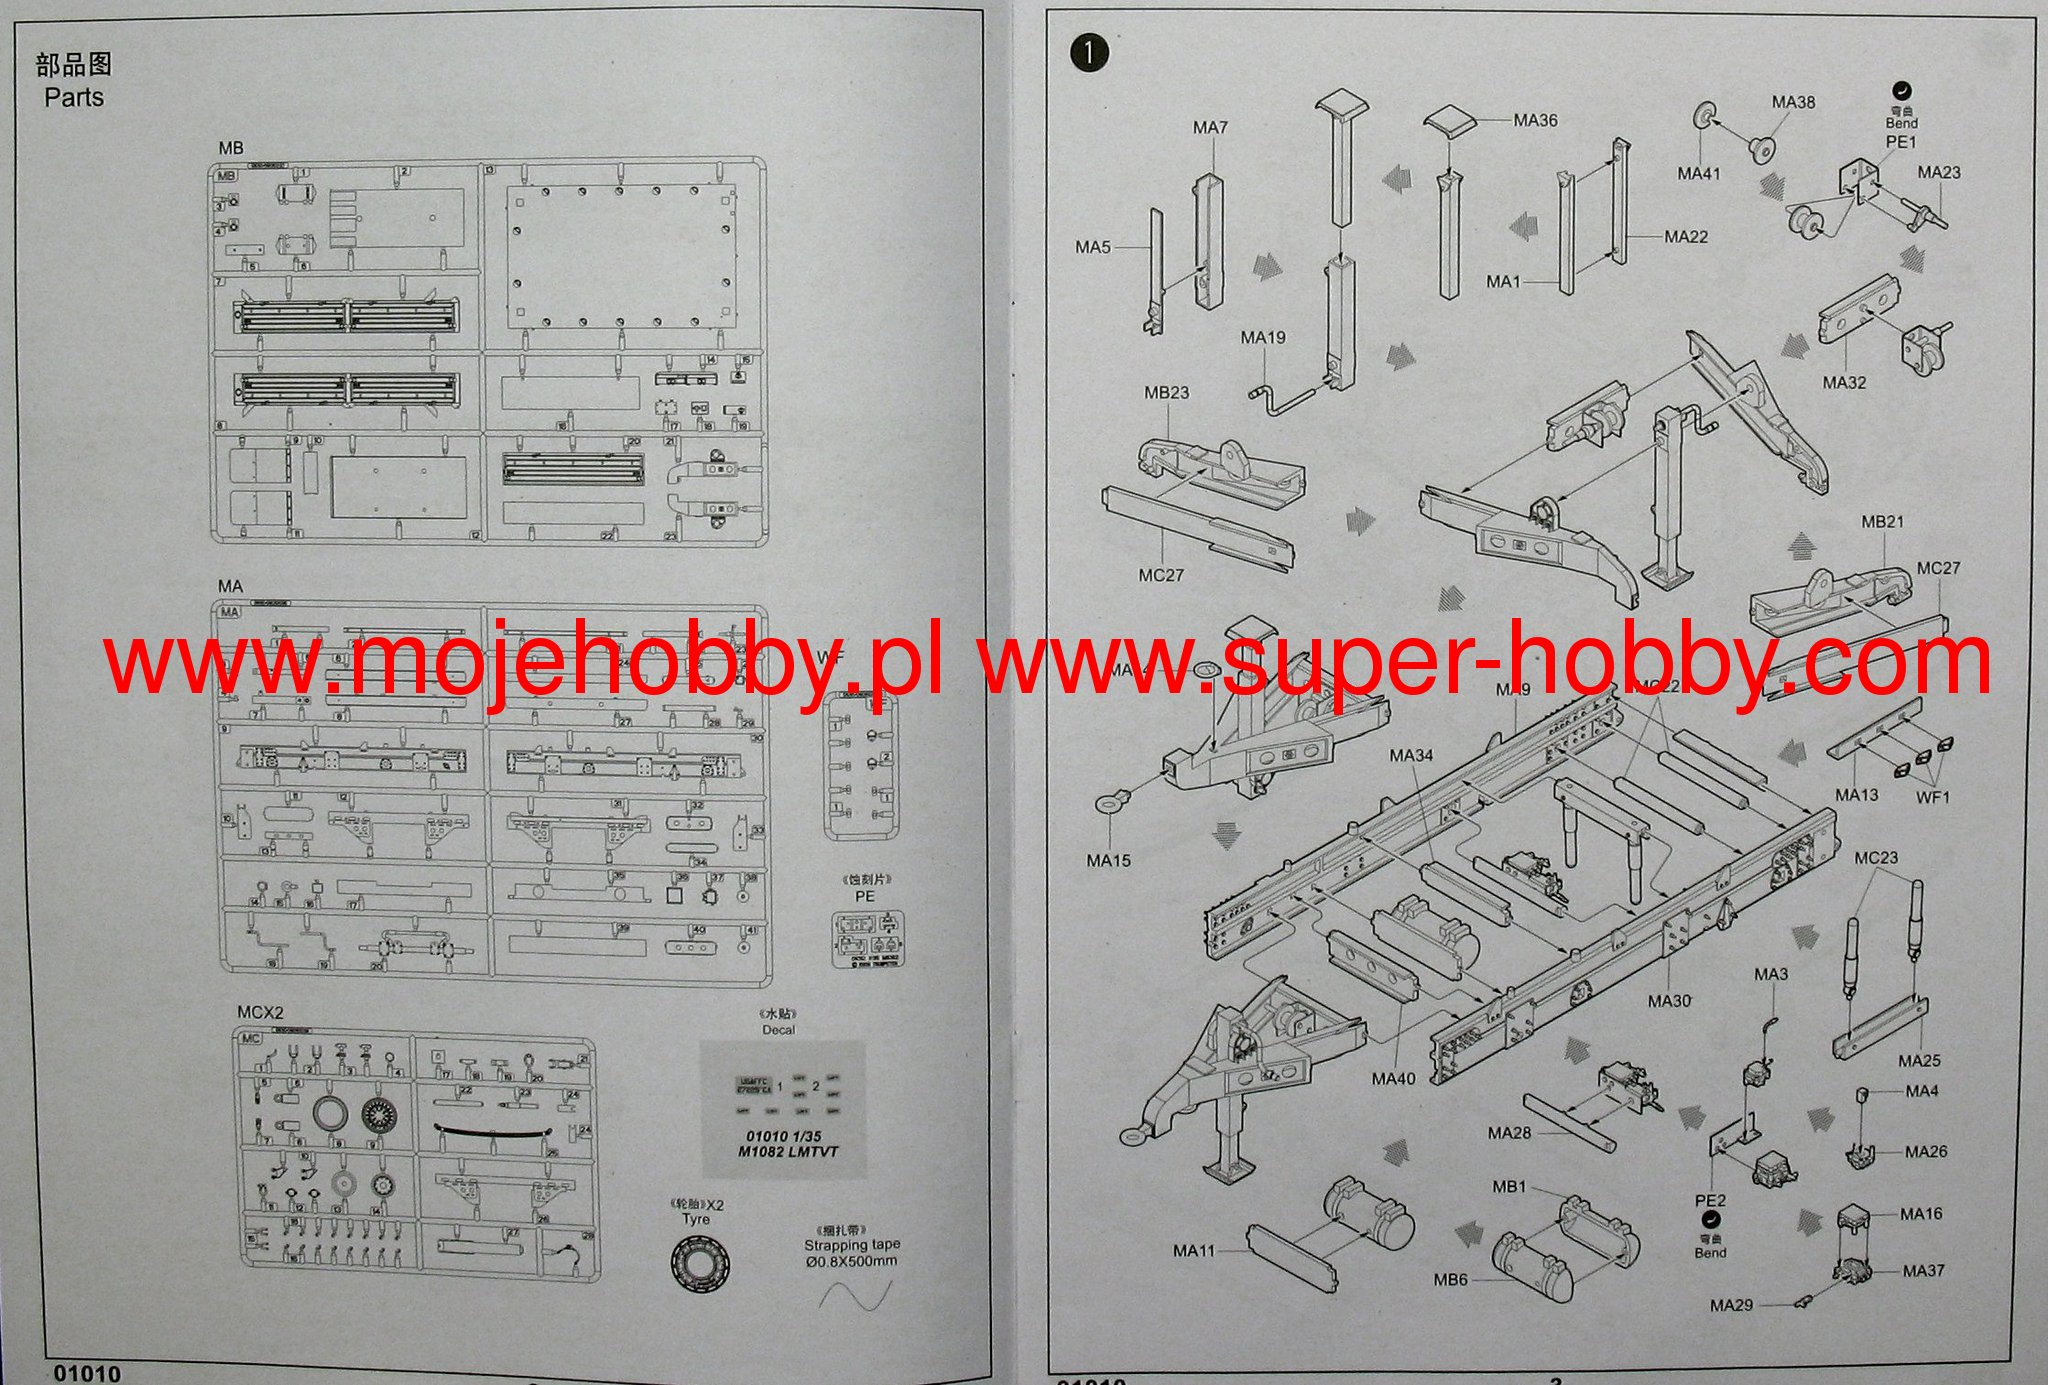 6397_2_tru01010_2 m1082 lmtv trailer trumpeter 01010 lmtv wiring diagram at bayanpartner.co